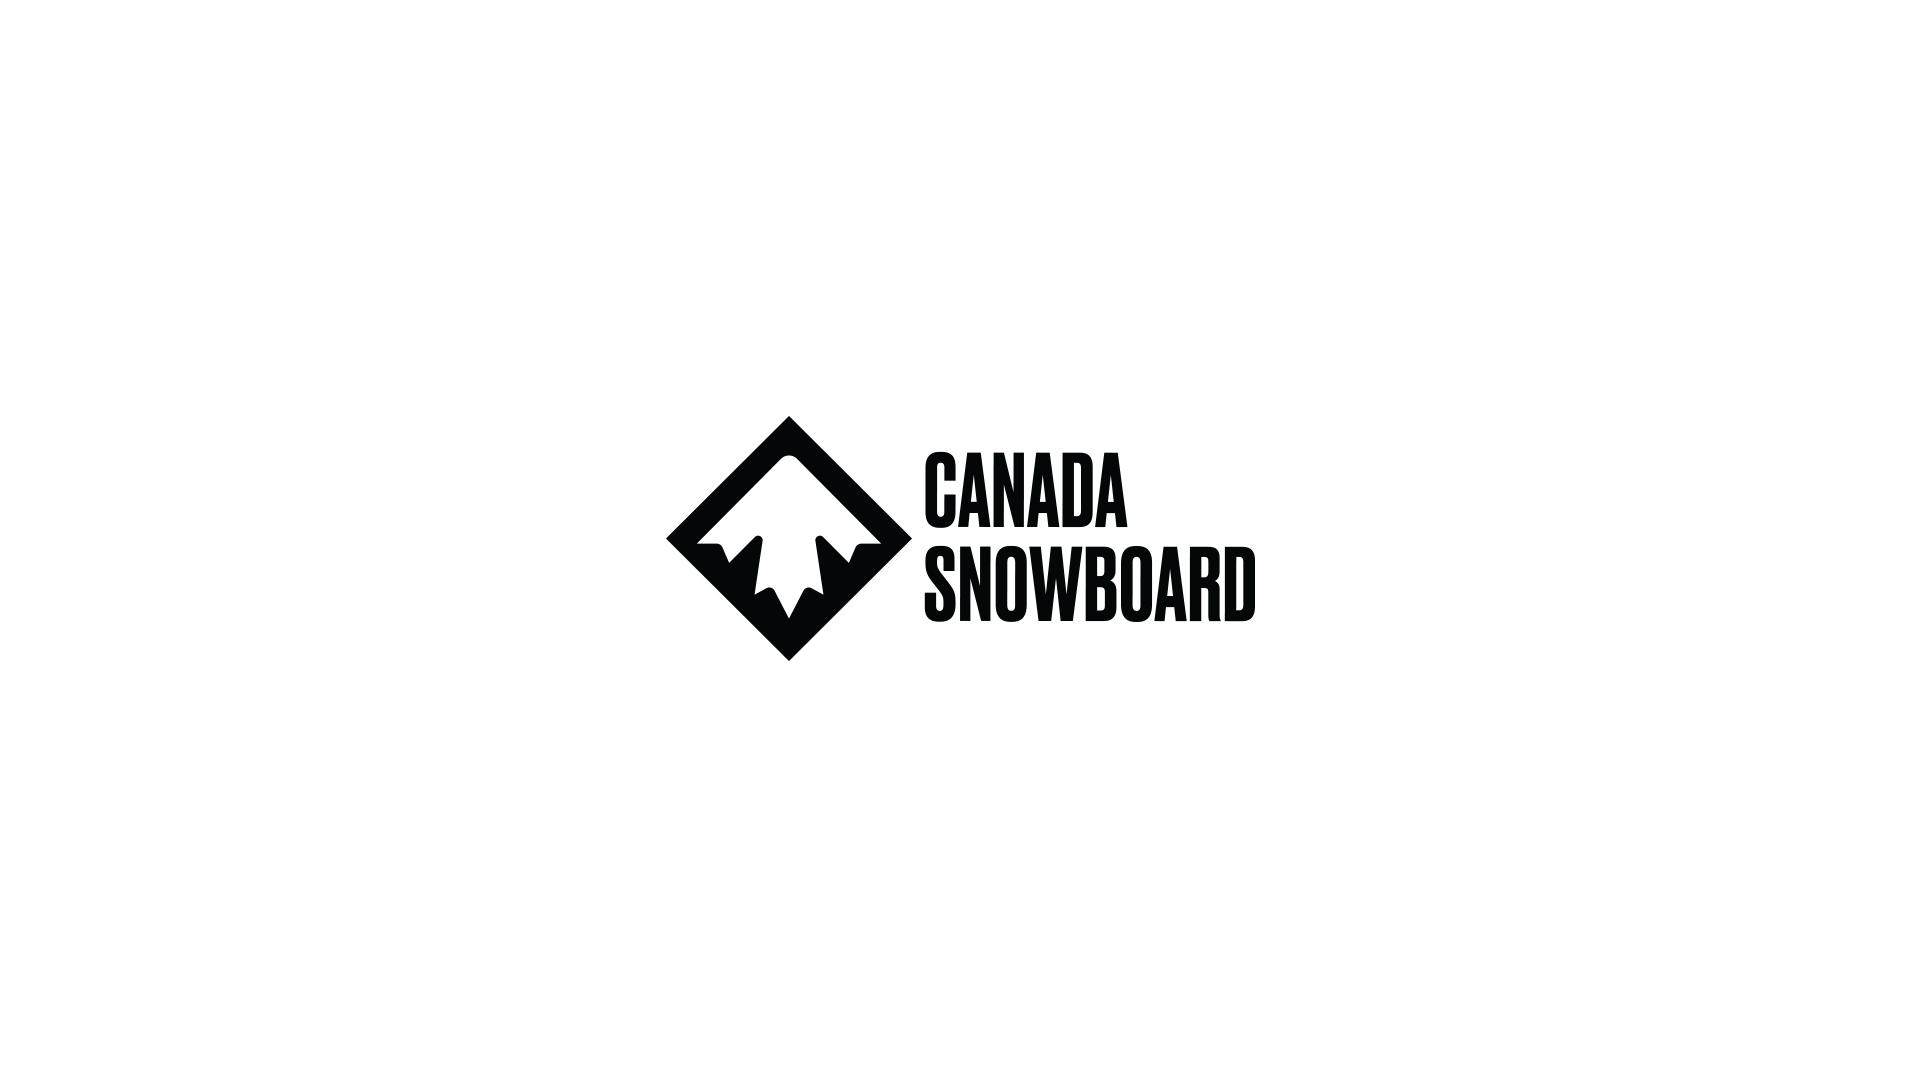 Brand Statement & Values - Canada Snowboard